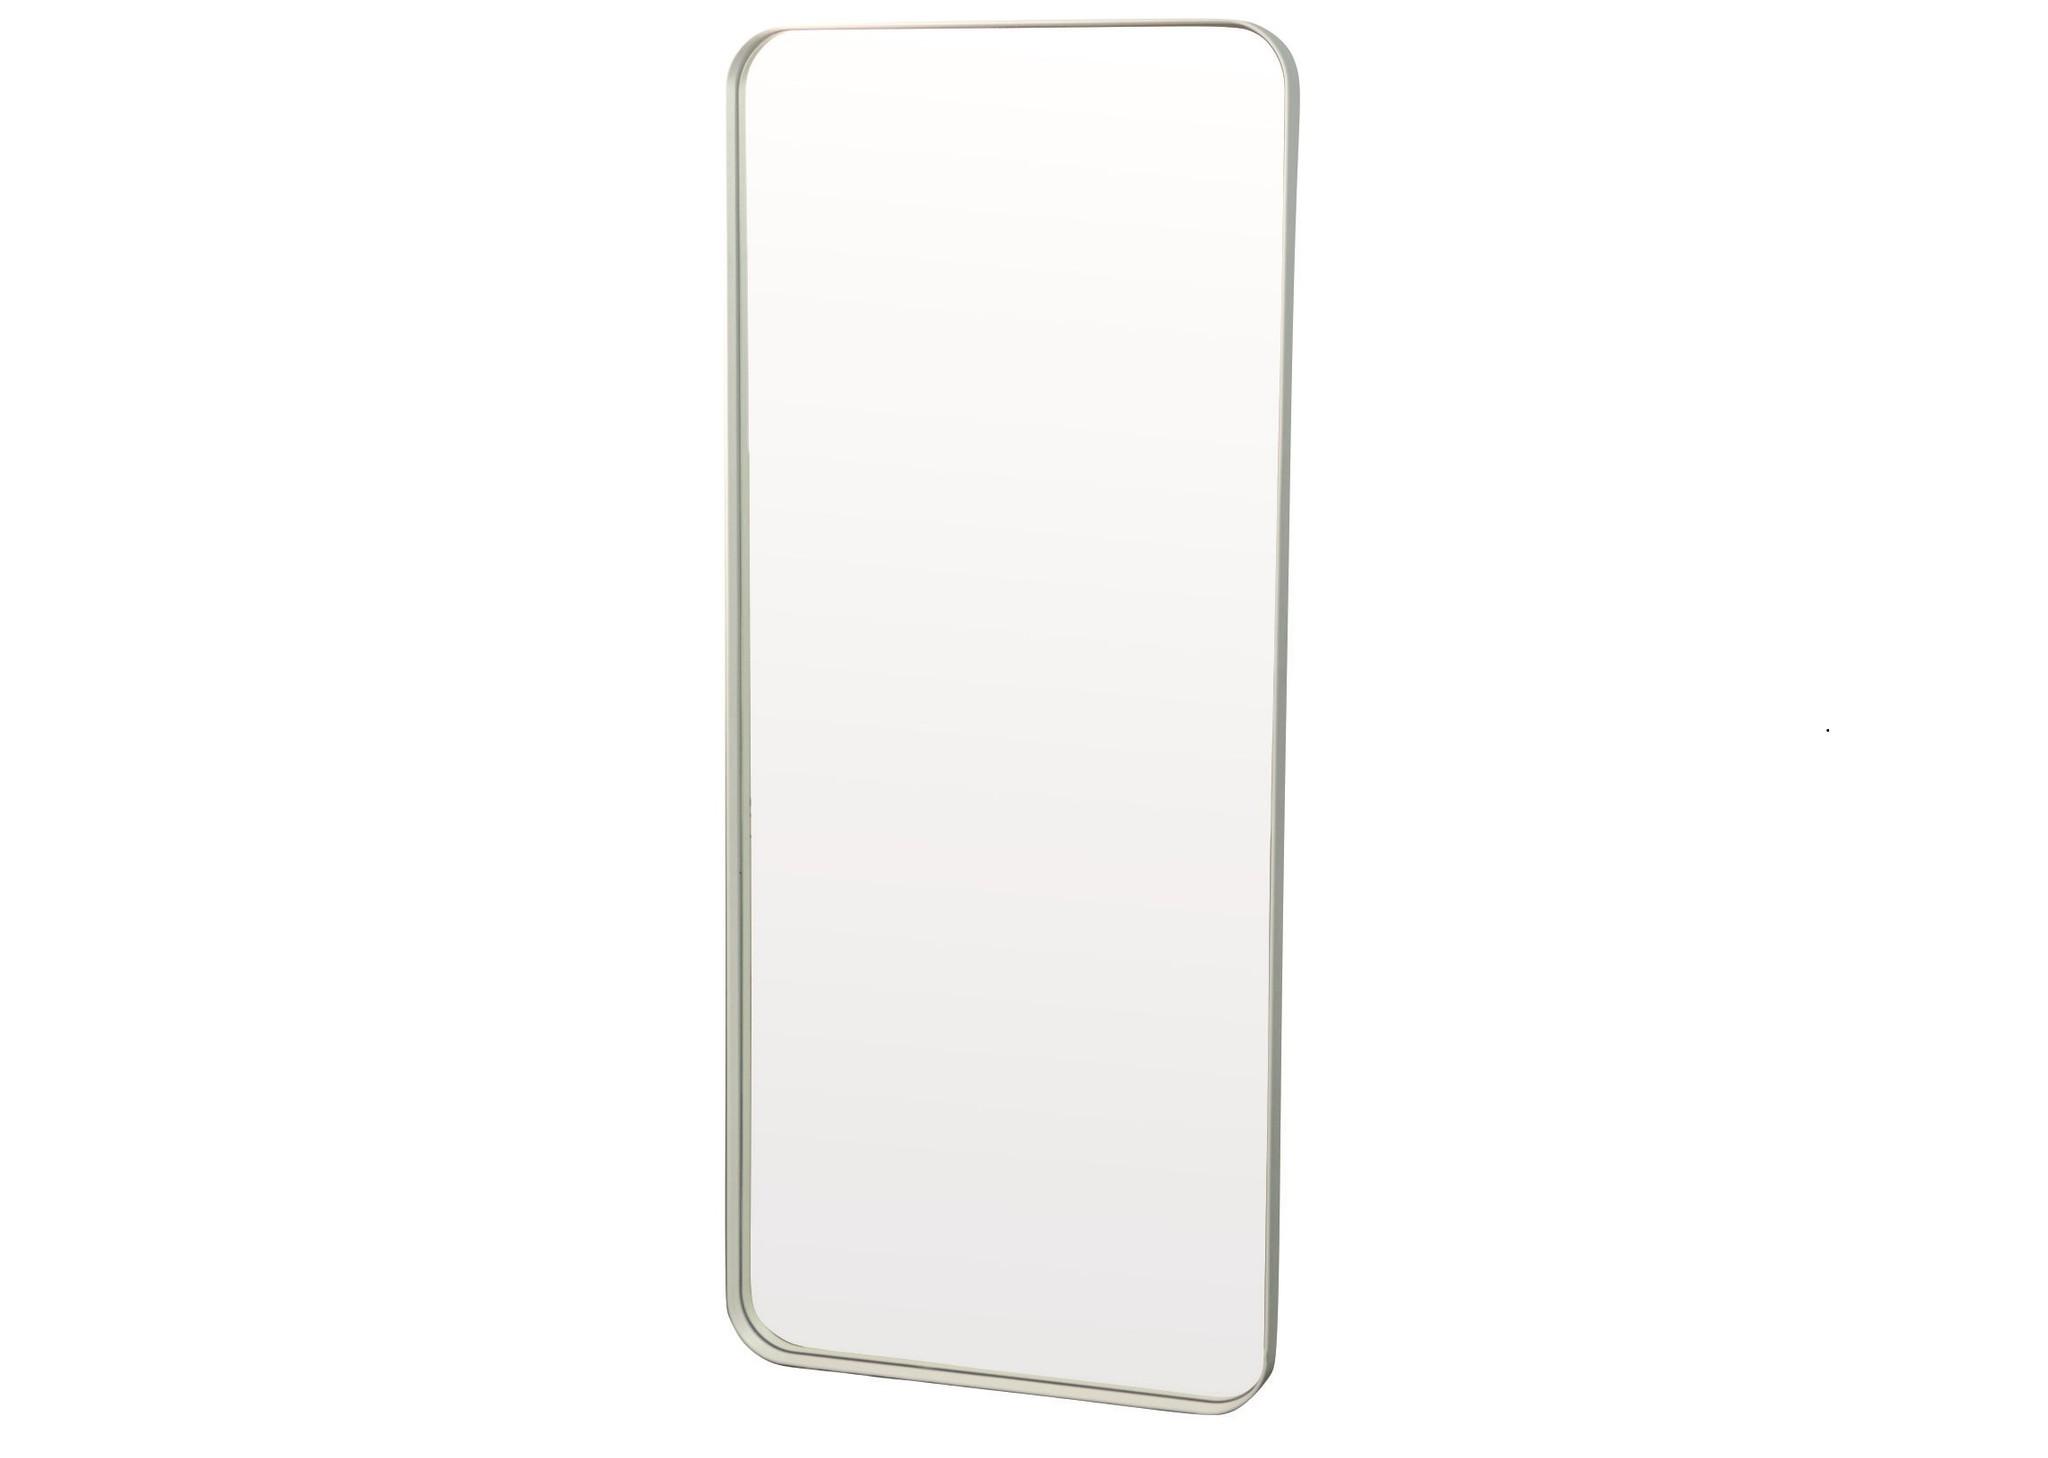 Настенное зеркало кира 140*60 (simple mirror) белый 60x140x4 см.